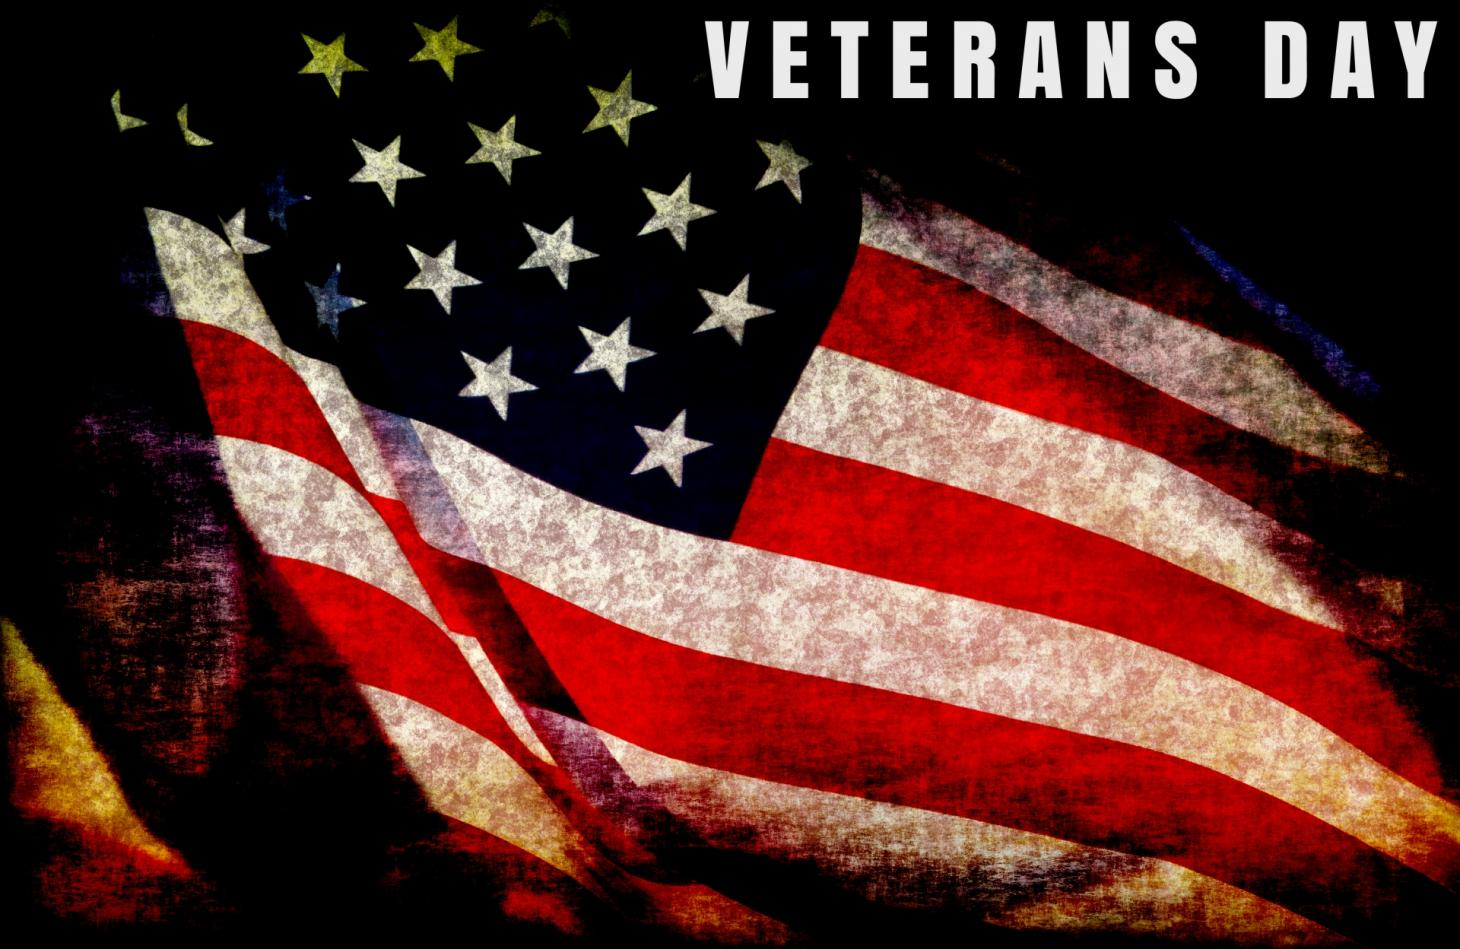 Veterans Day is Sunday